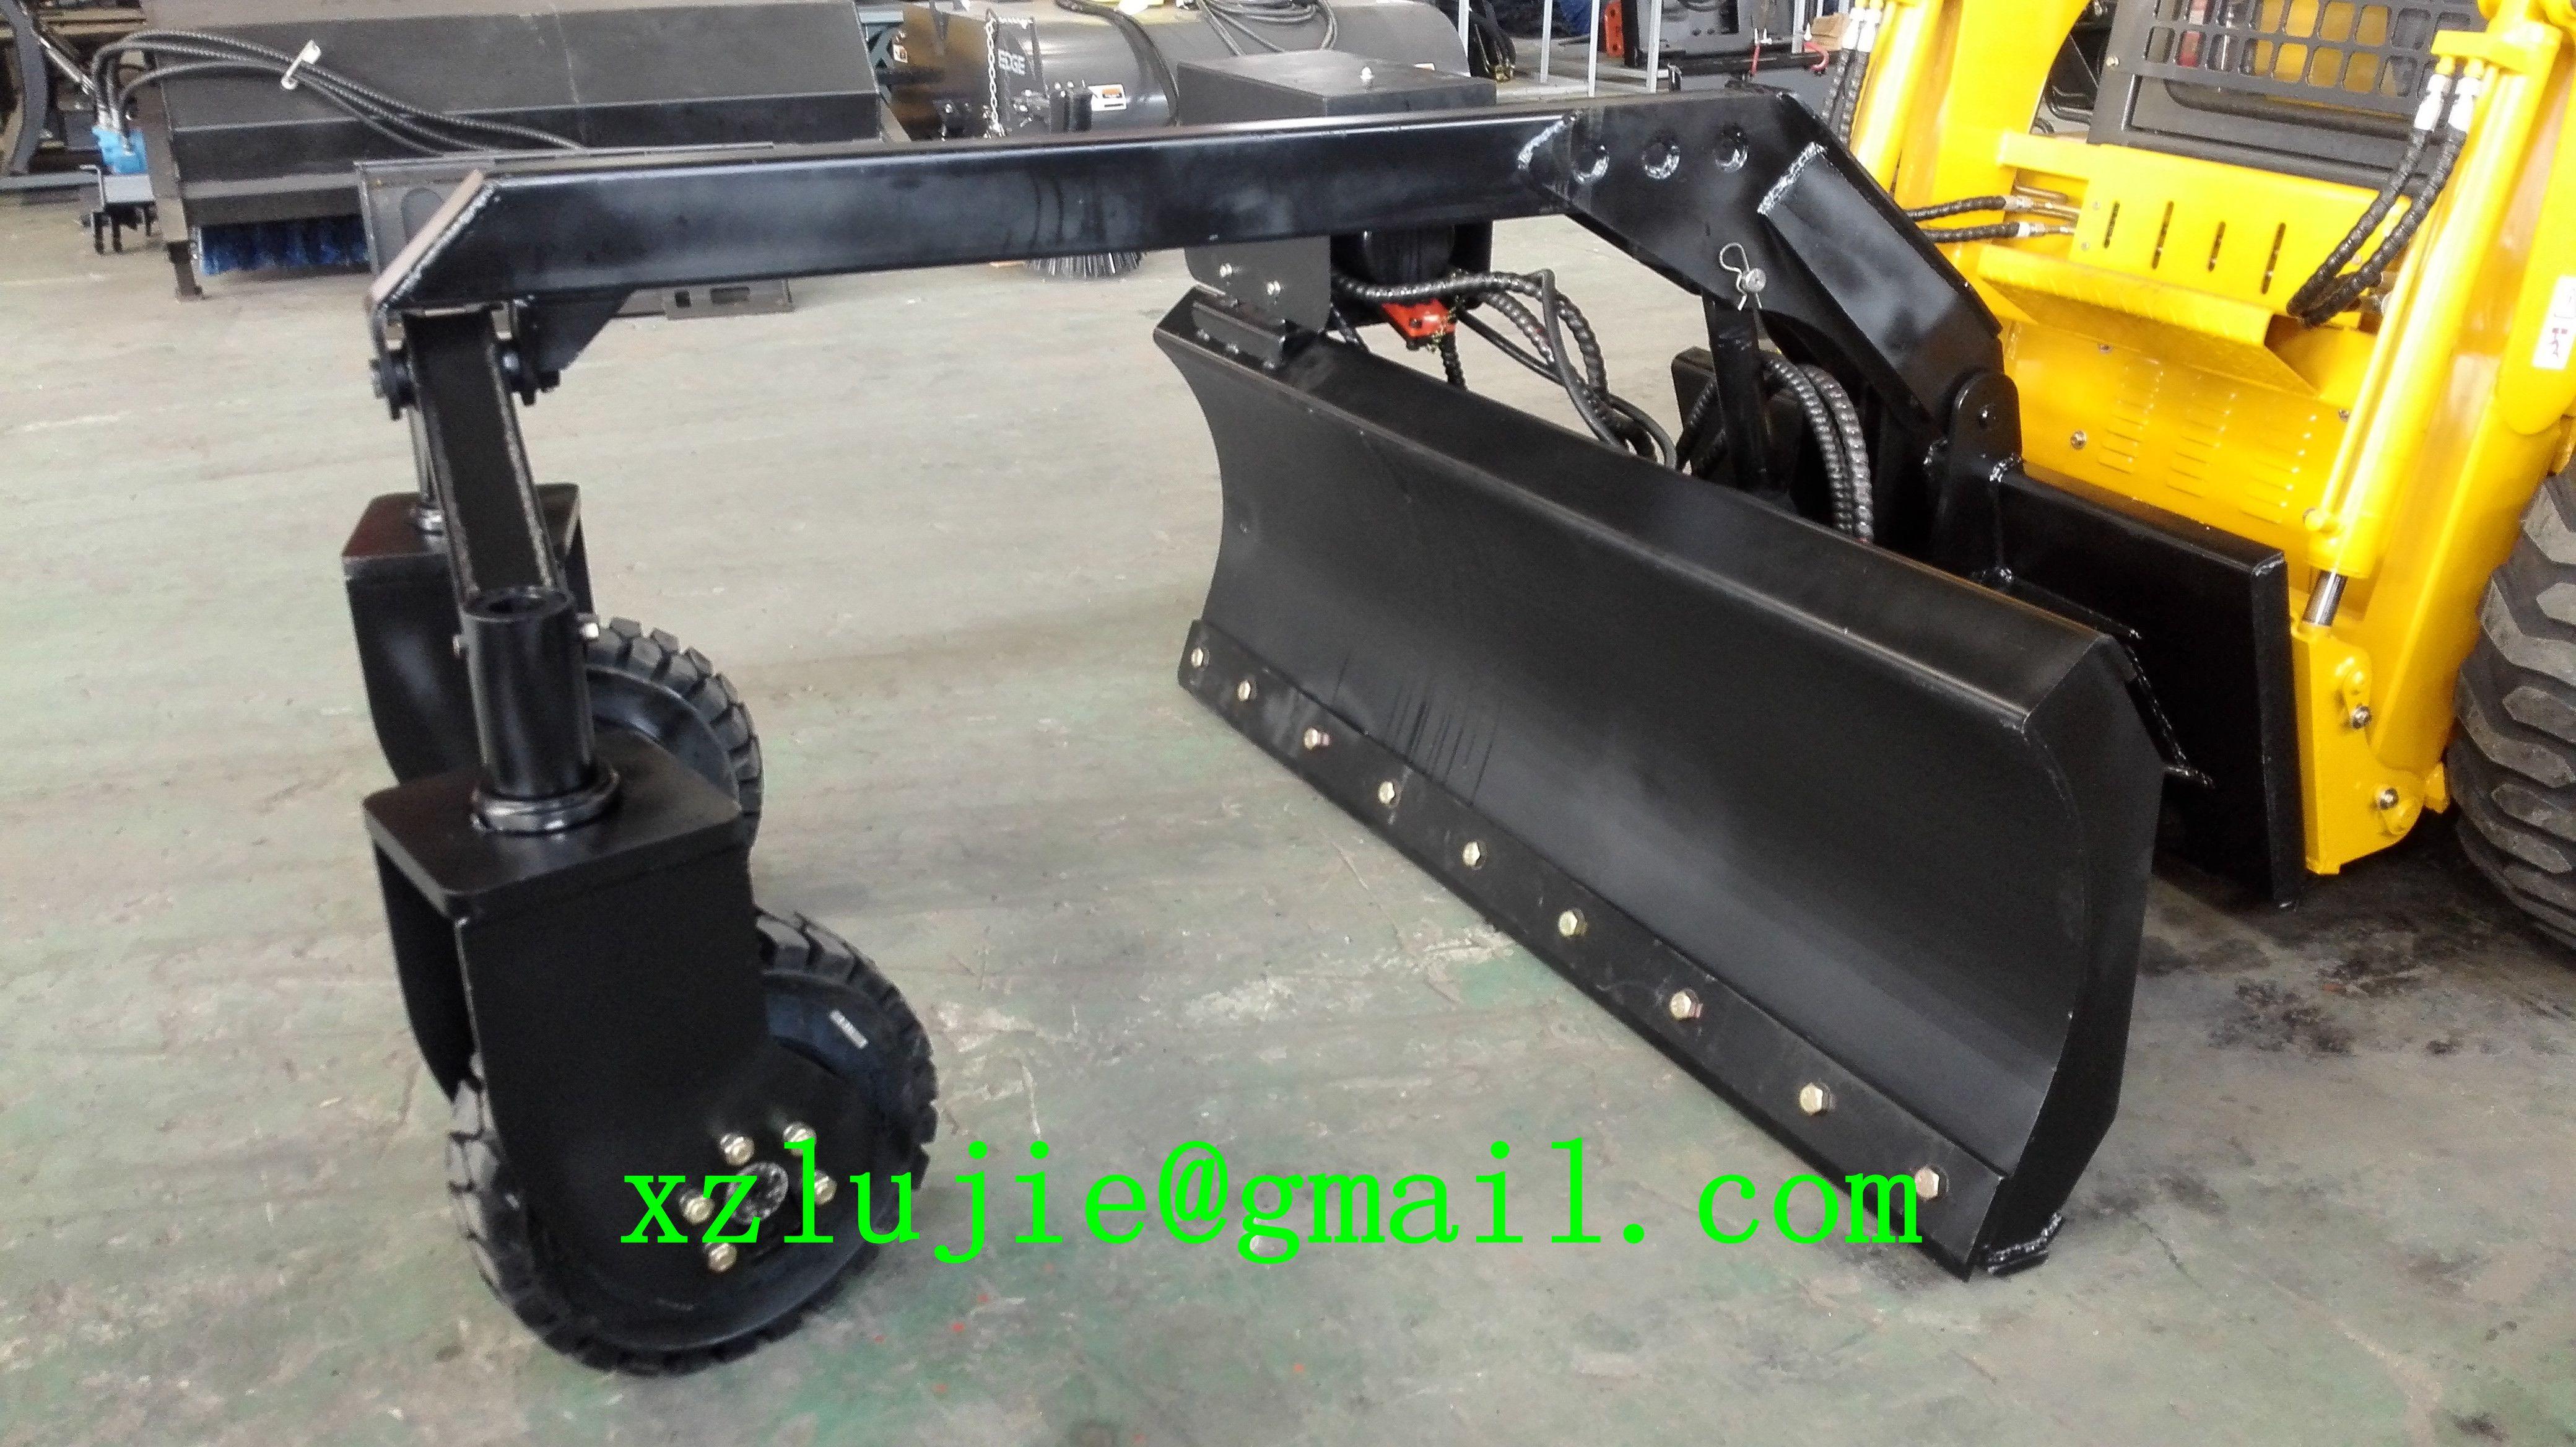 skid steer loader grader attachments,www.xzlujie.com